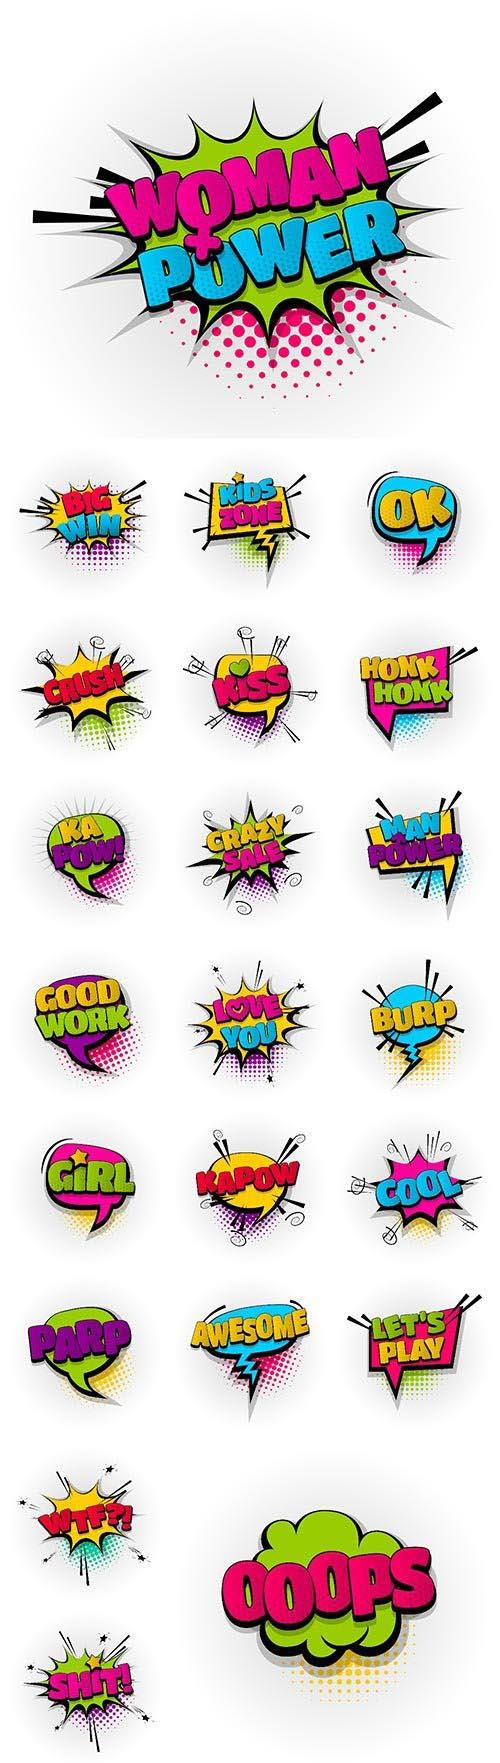 25 comic book text effects template, comics speech bubble halftone pop art style